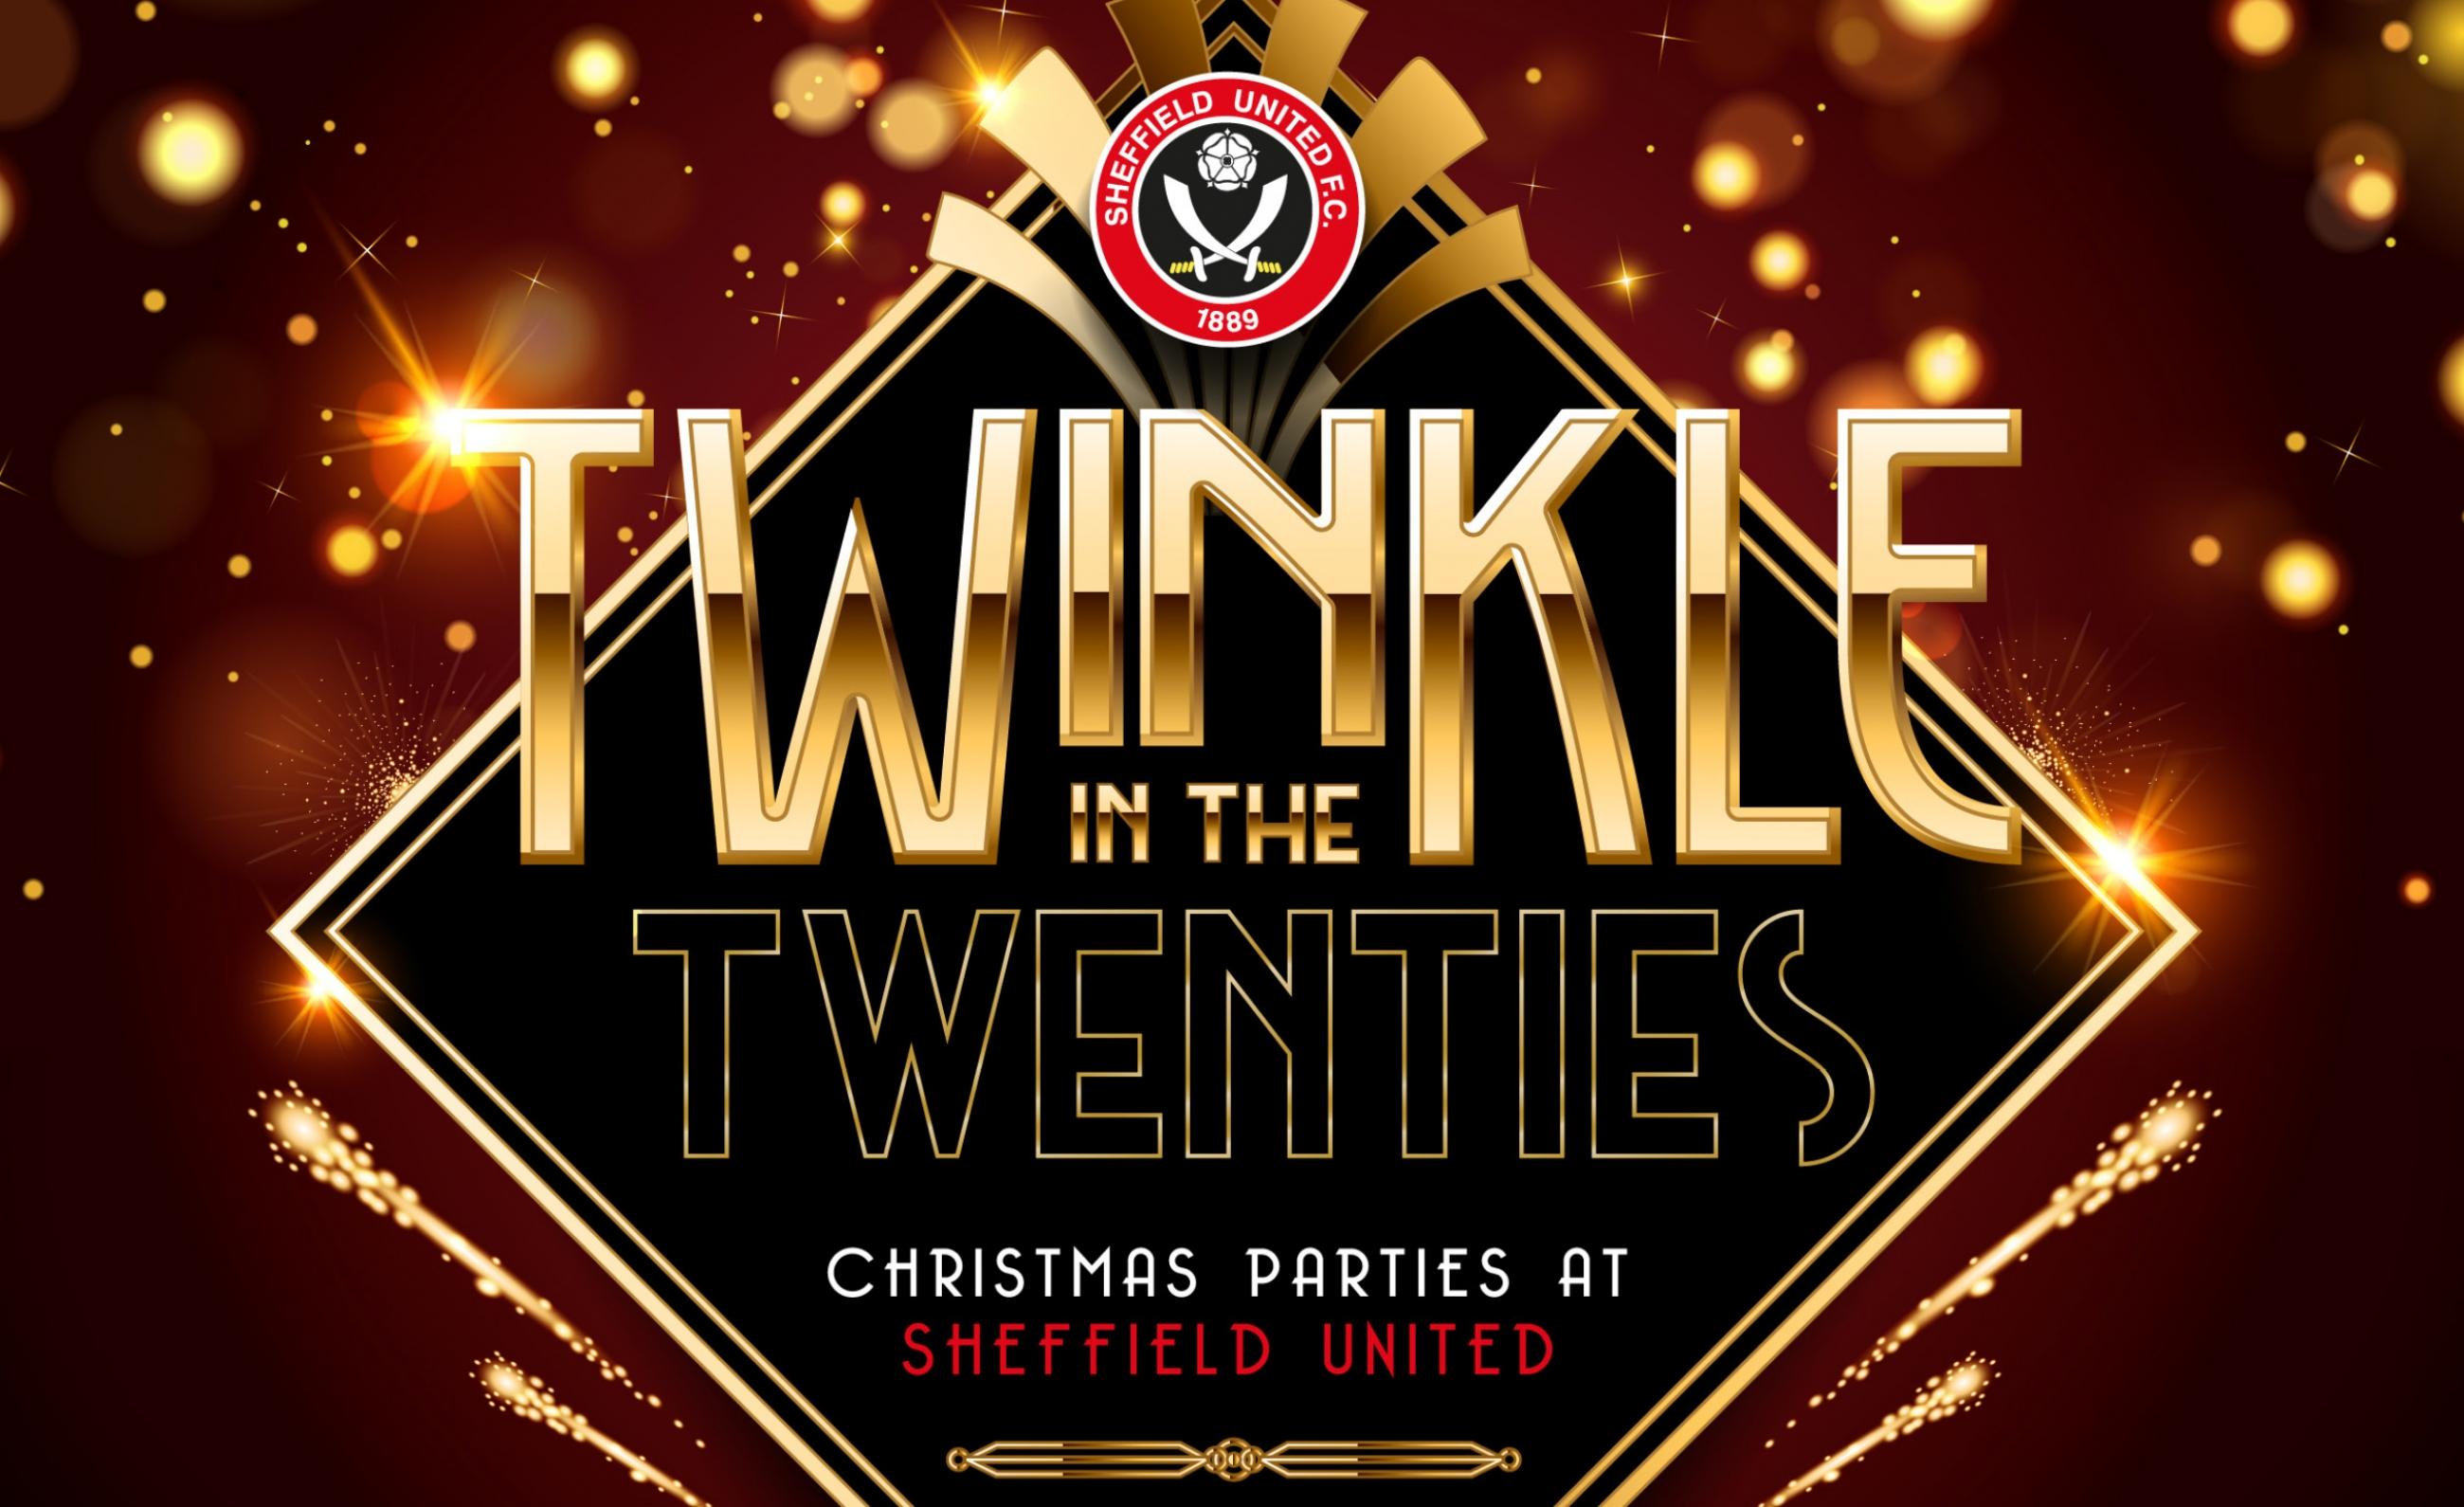 sufc-christmas-2021-twinkle-in-the-twenties-web-tile